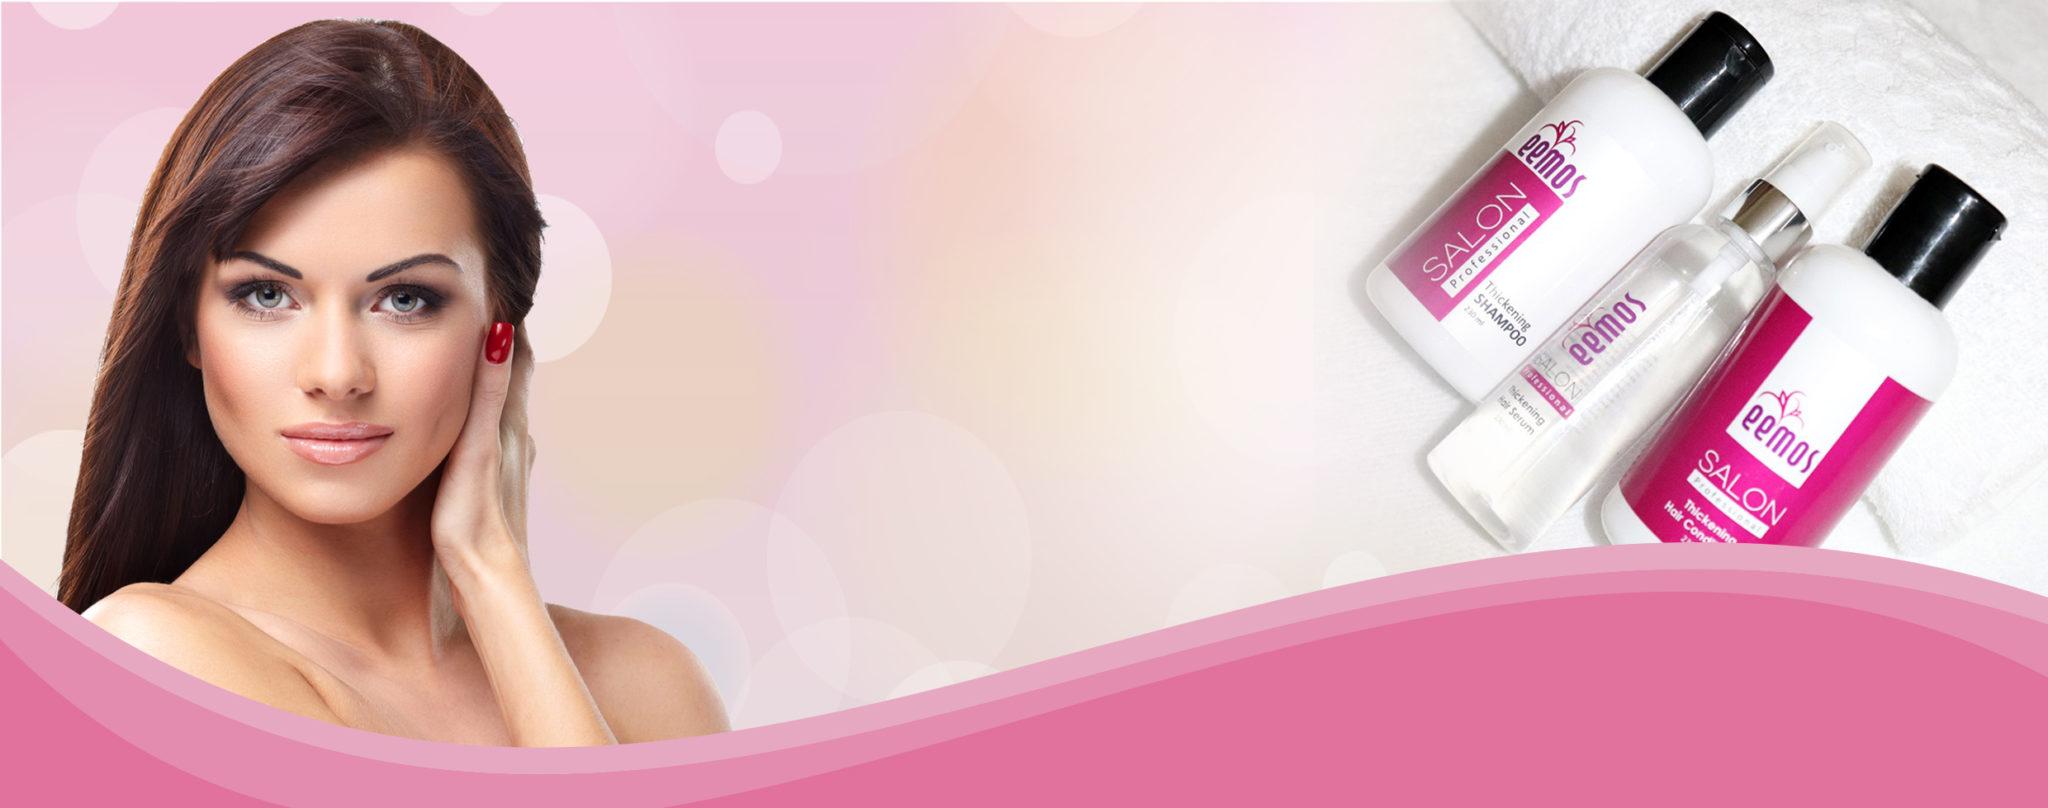 Best Ladies Beauty Parlour Services In Tirupati Facial